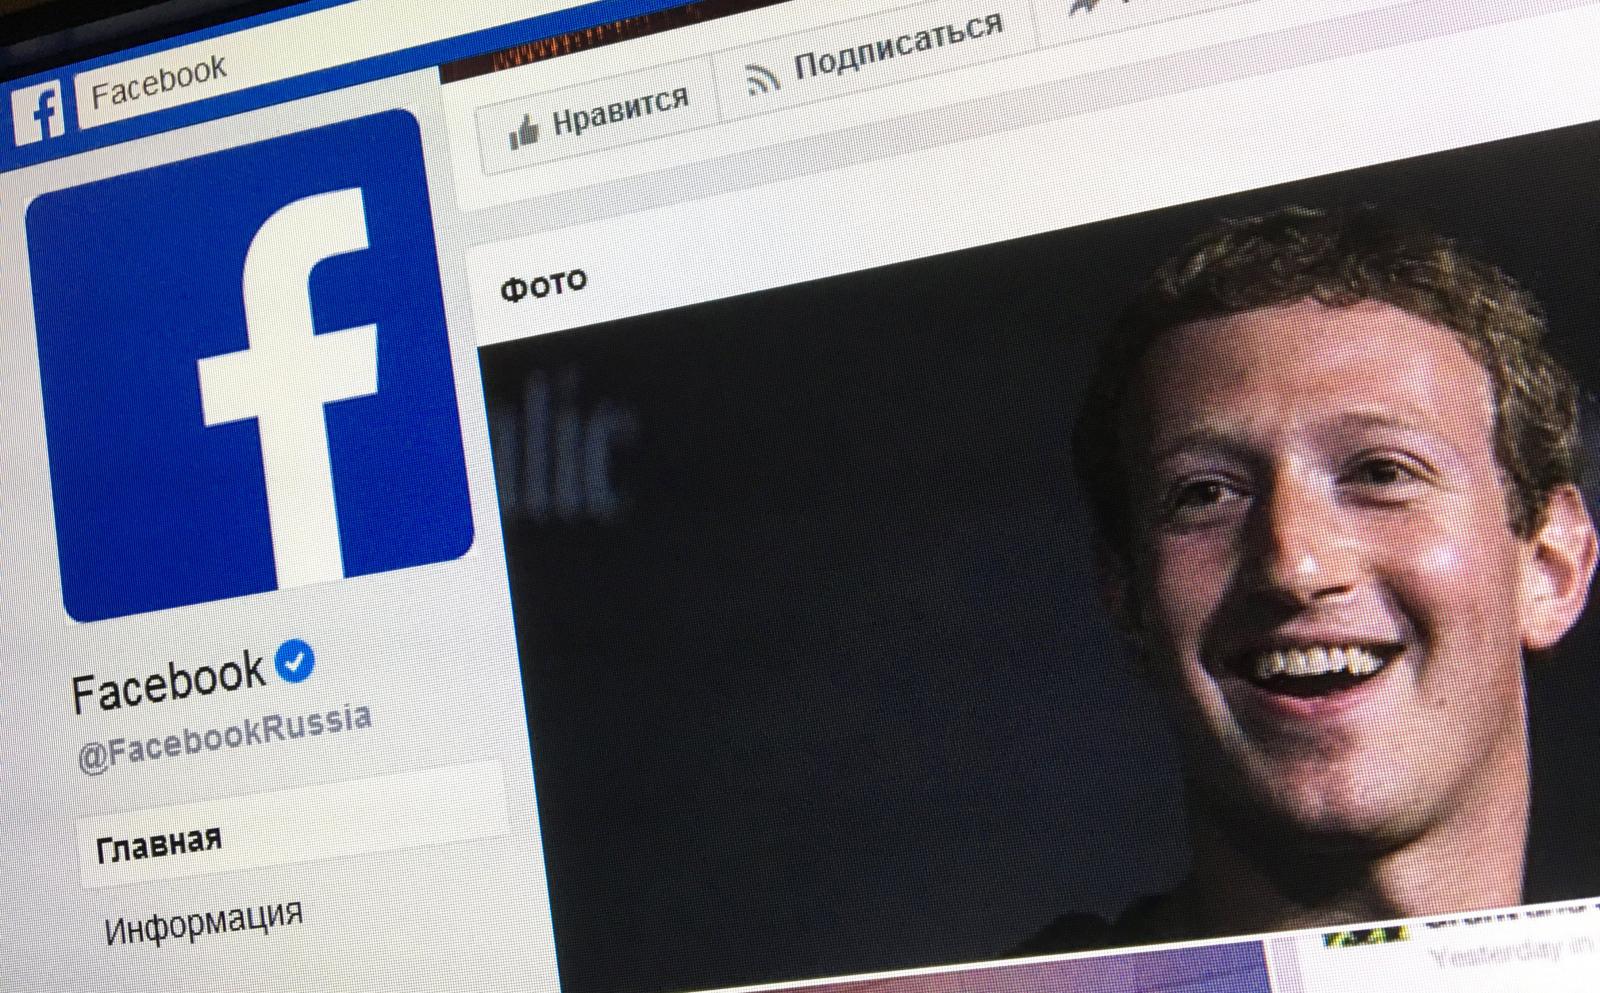 Facebook takes down pro-Kremlin video channels